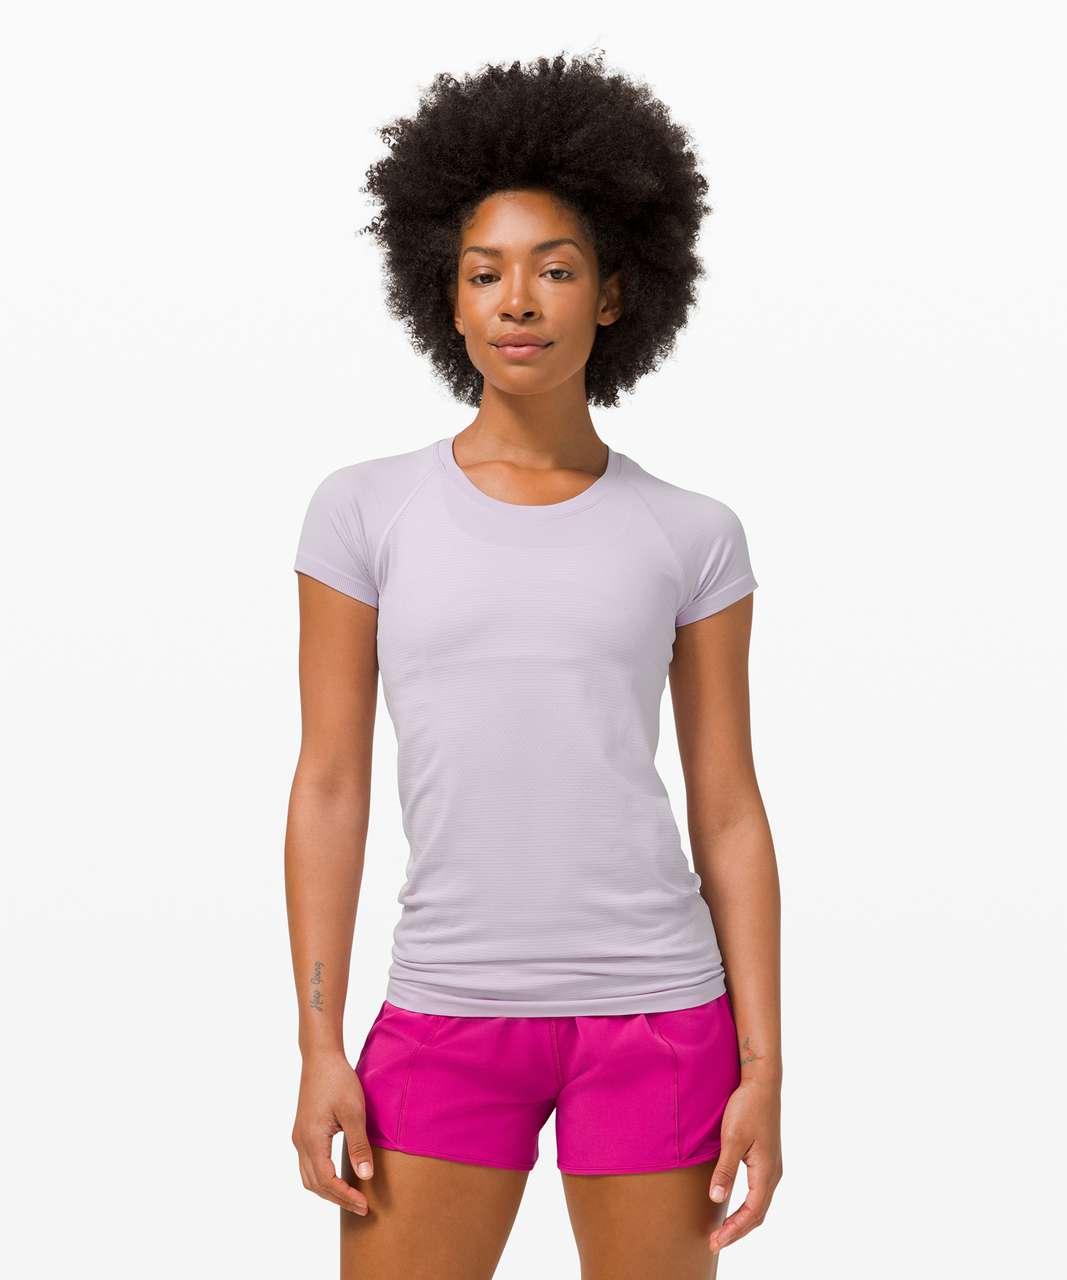 Lululemon Swiftly Tech Short Sleeve 2.0 - Lavender Dew / Lavender Dew